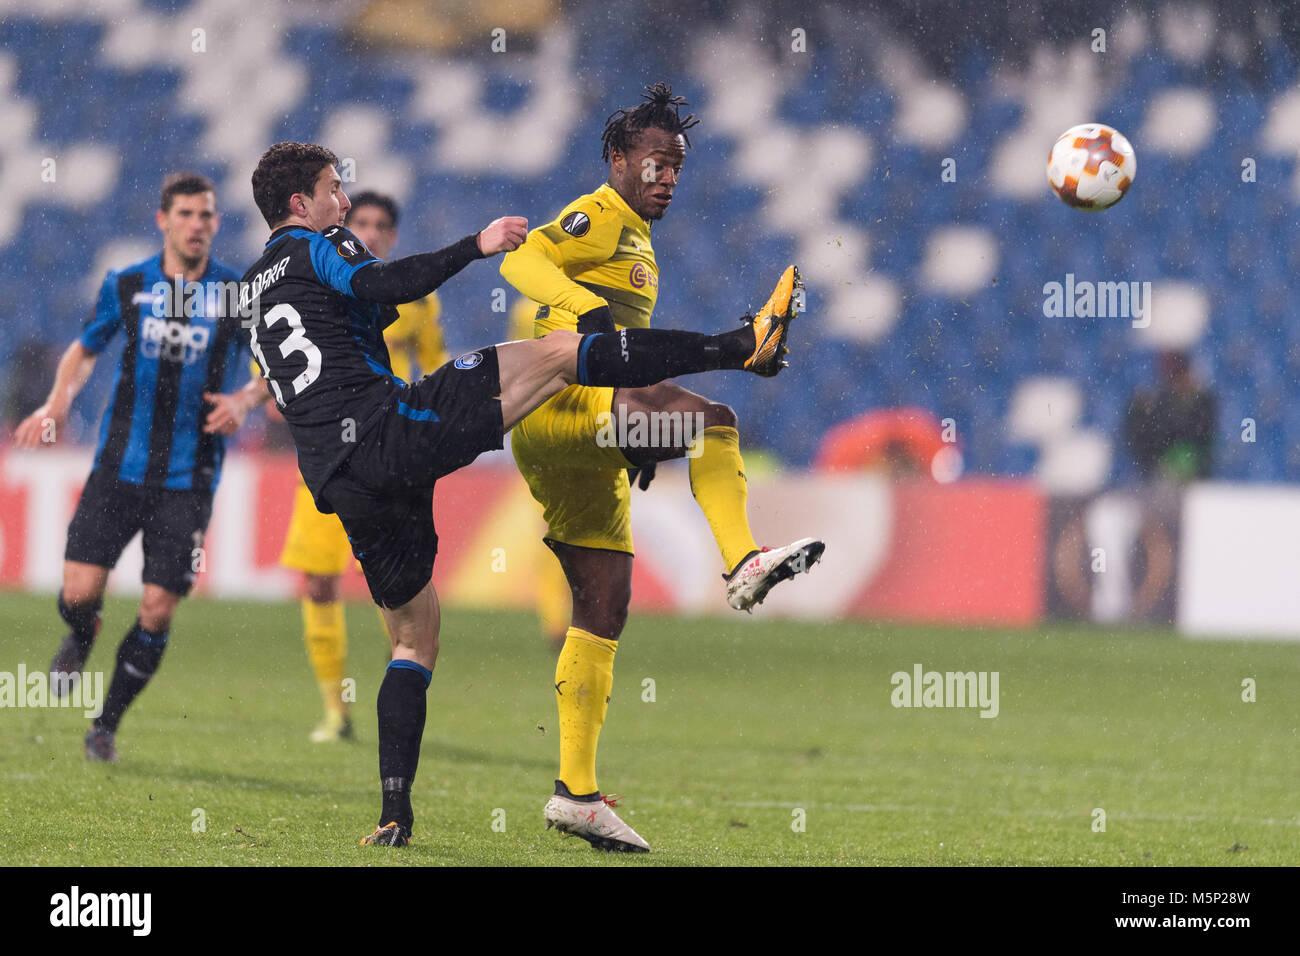 Michy Batshuayi Atunga of Borussia Dortmund and Mattia Caldara of Atalanta during the Uefa 'Europa League' - Stock Image